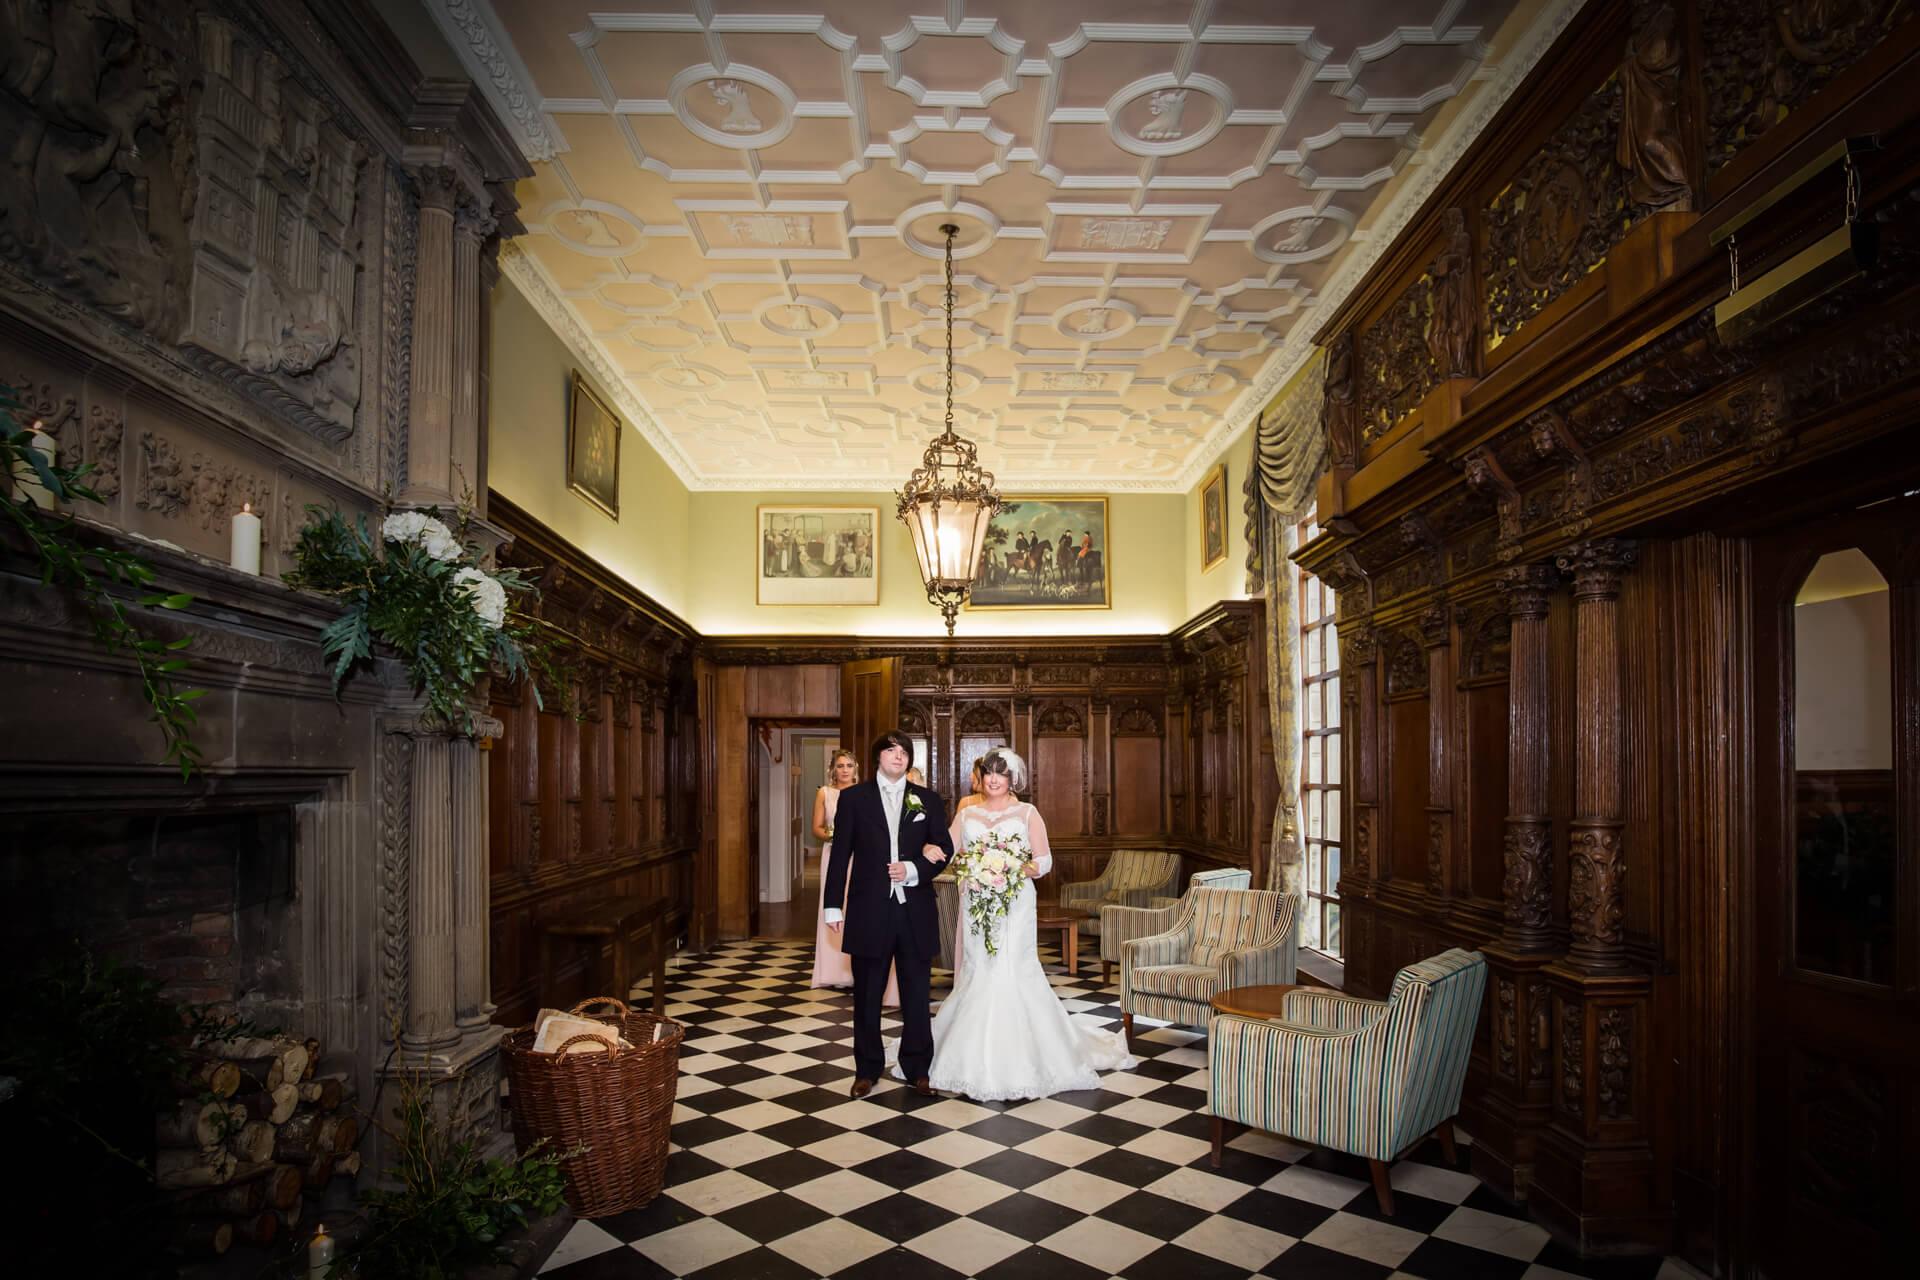 Bride waiting to enter the ceremony at Hazlewood Castle